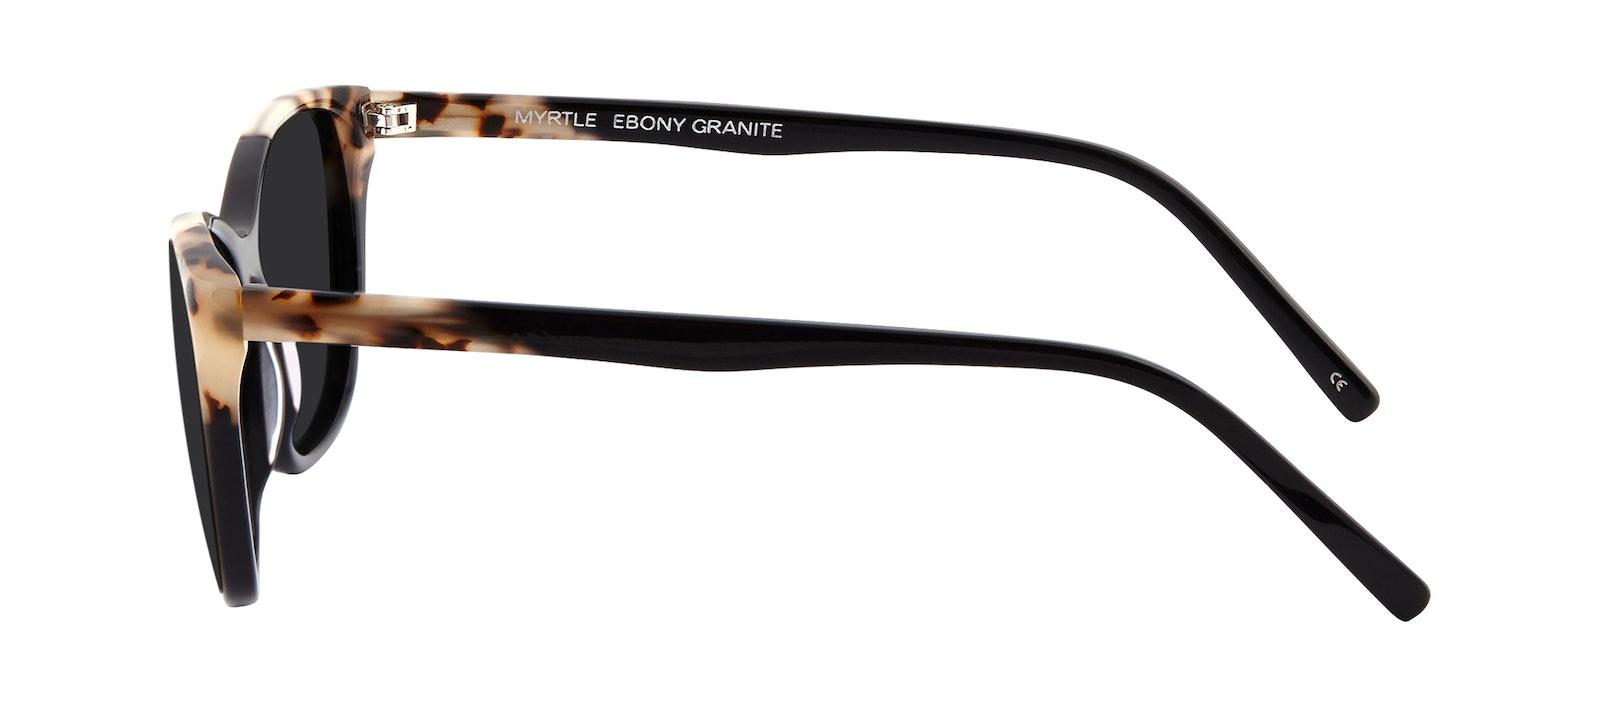 Affordable Fashion Glasses Cat Eye Rectangle Sunglasses Women Myrtle Ebony Granite Side